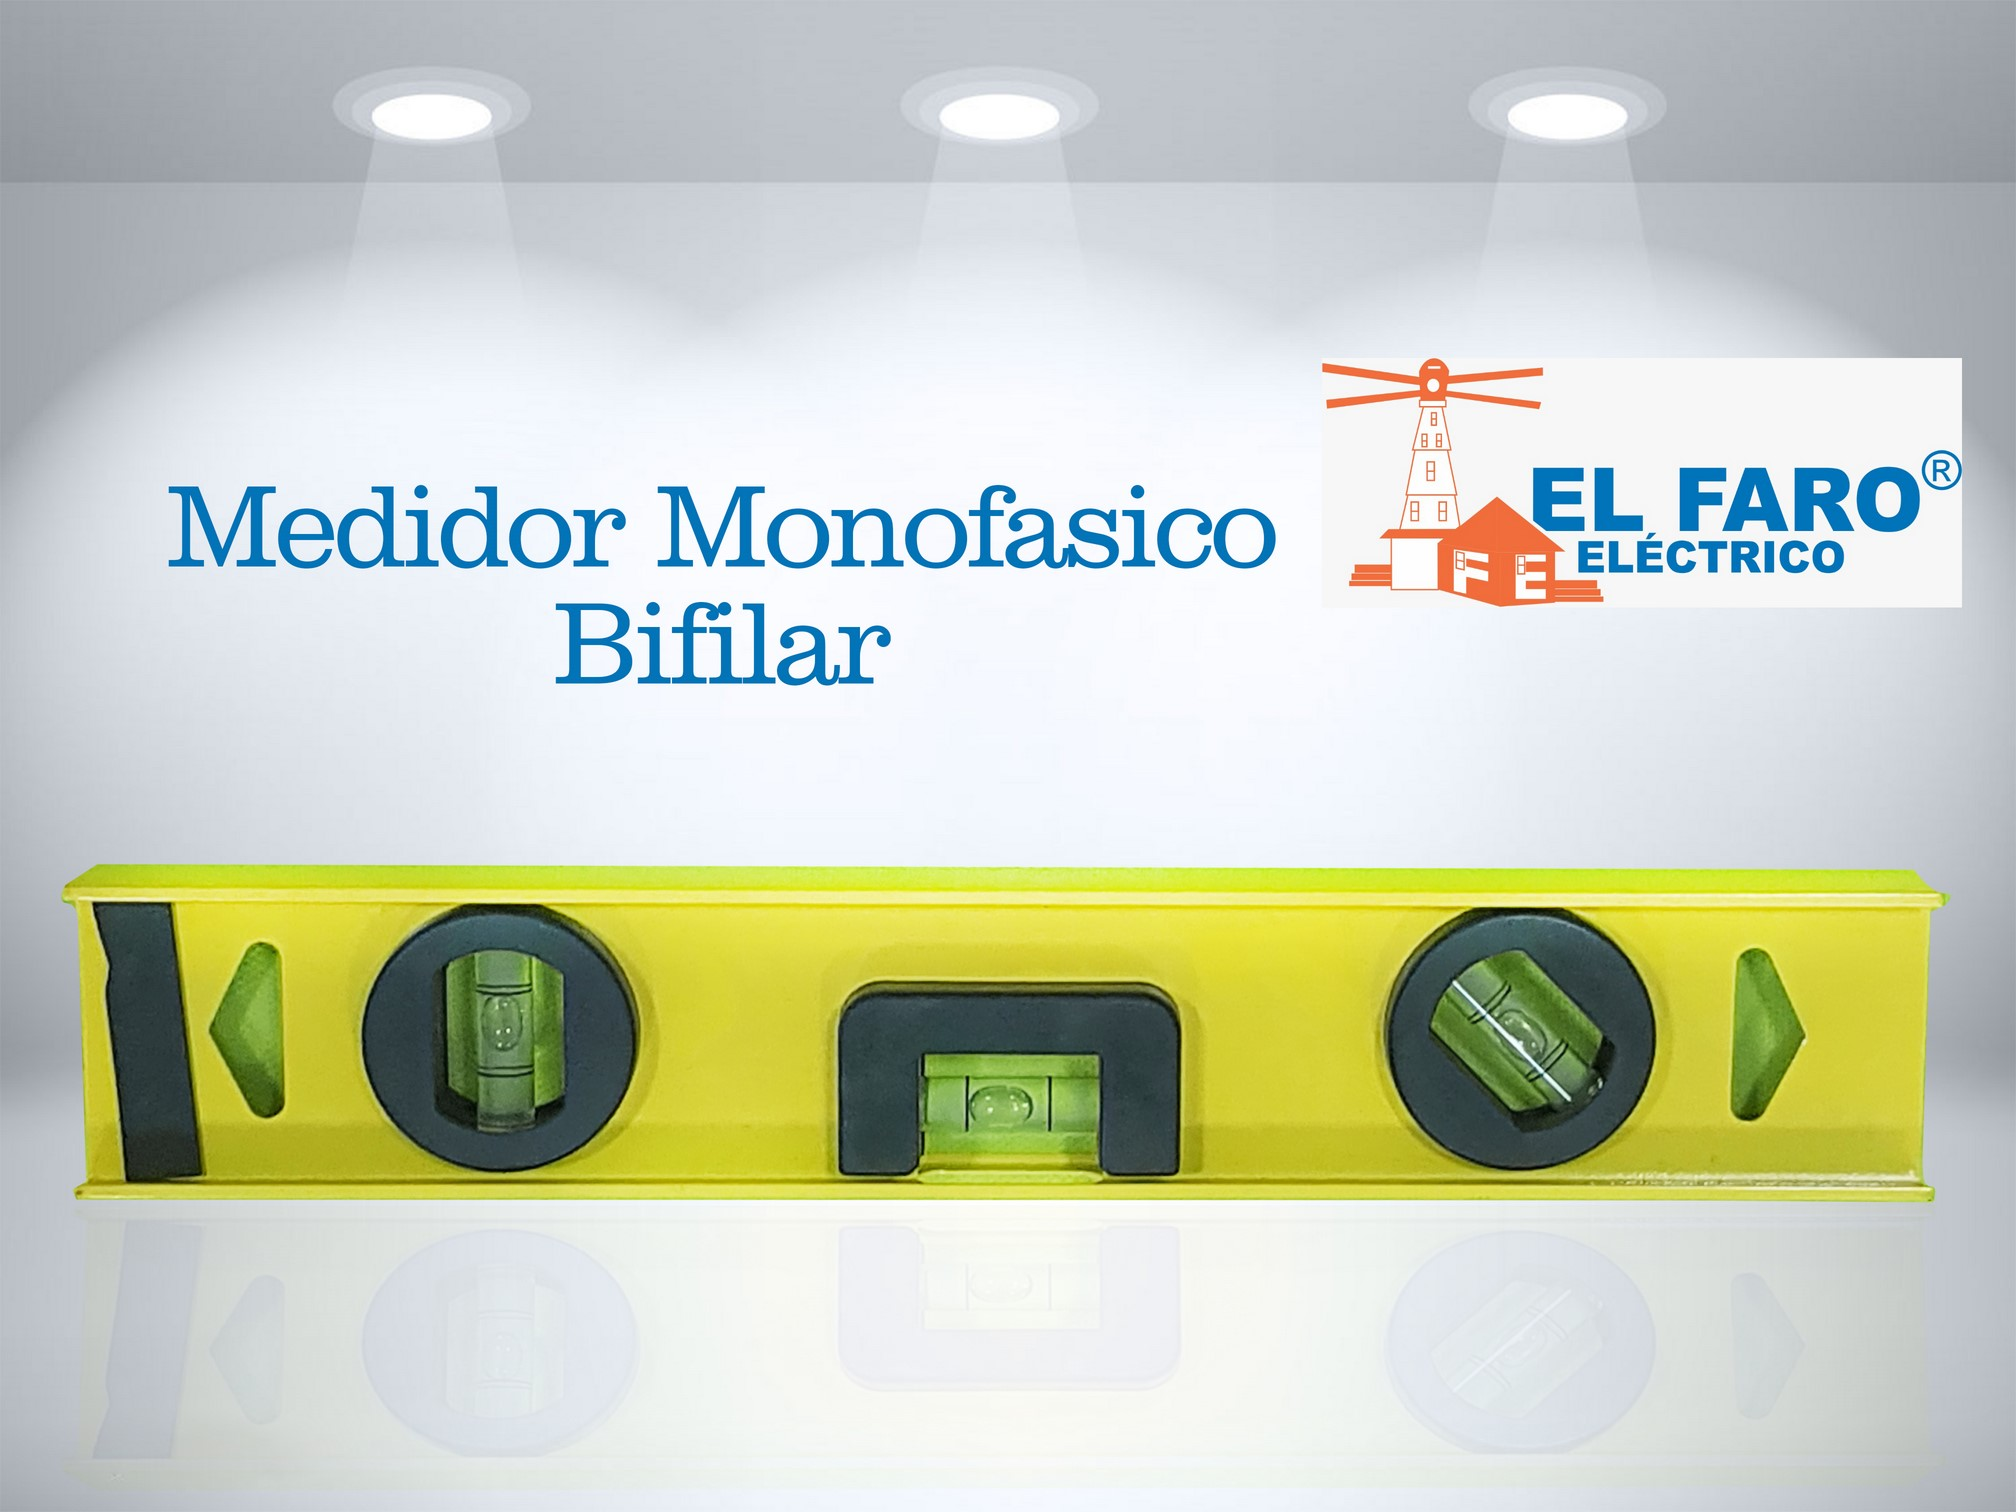 Medidor Monofasico Bifilar